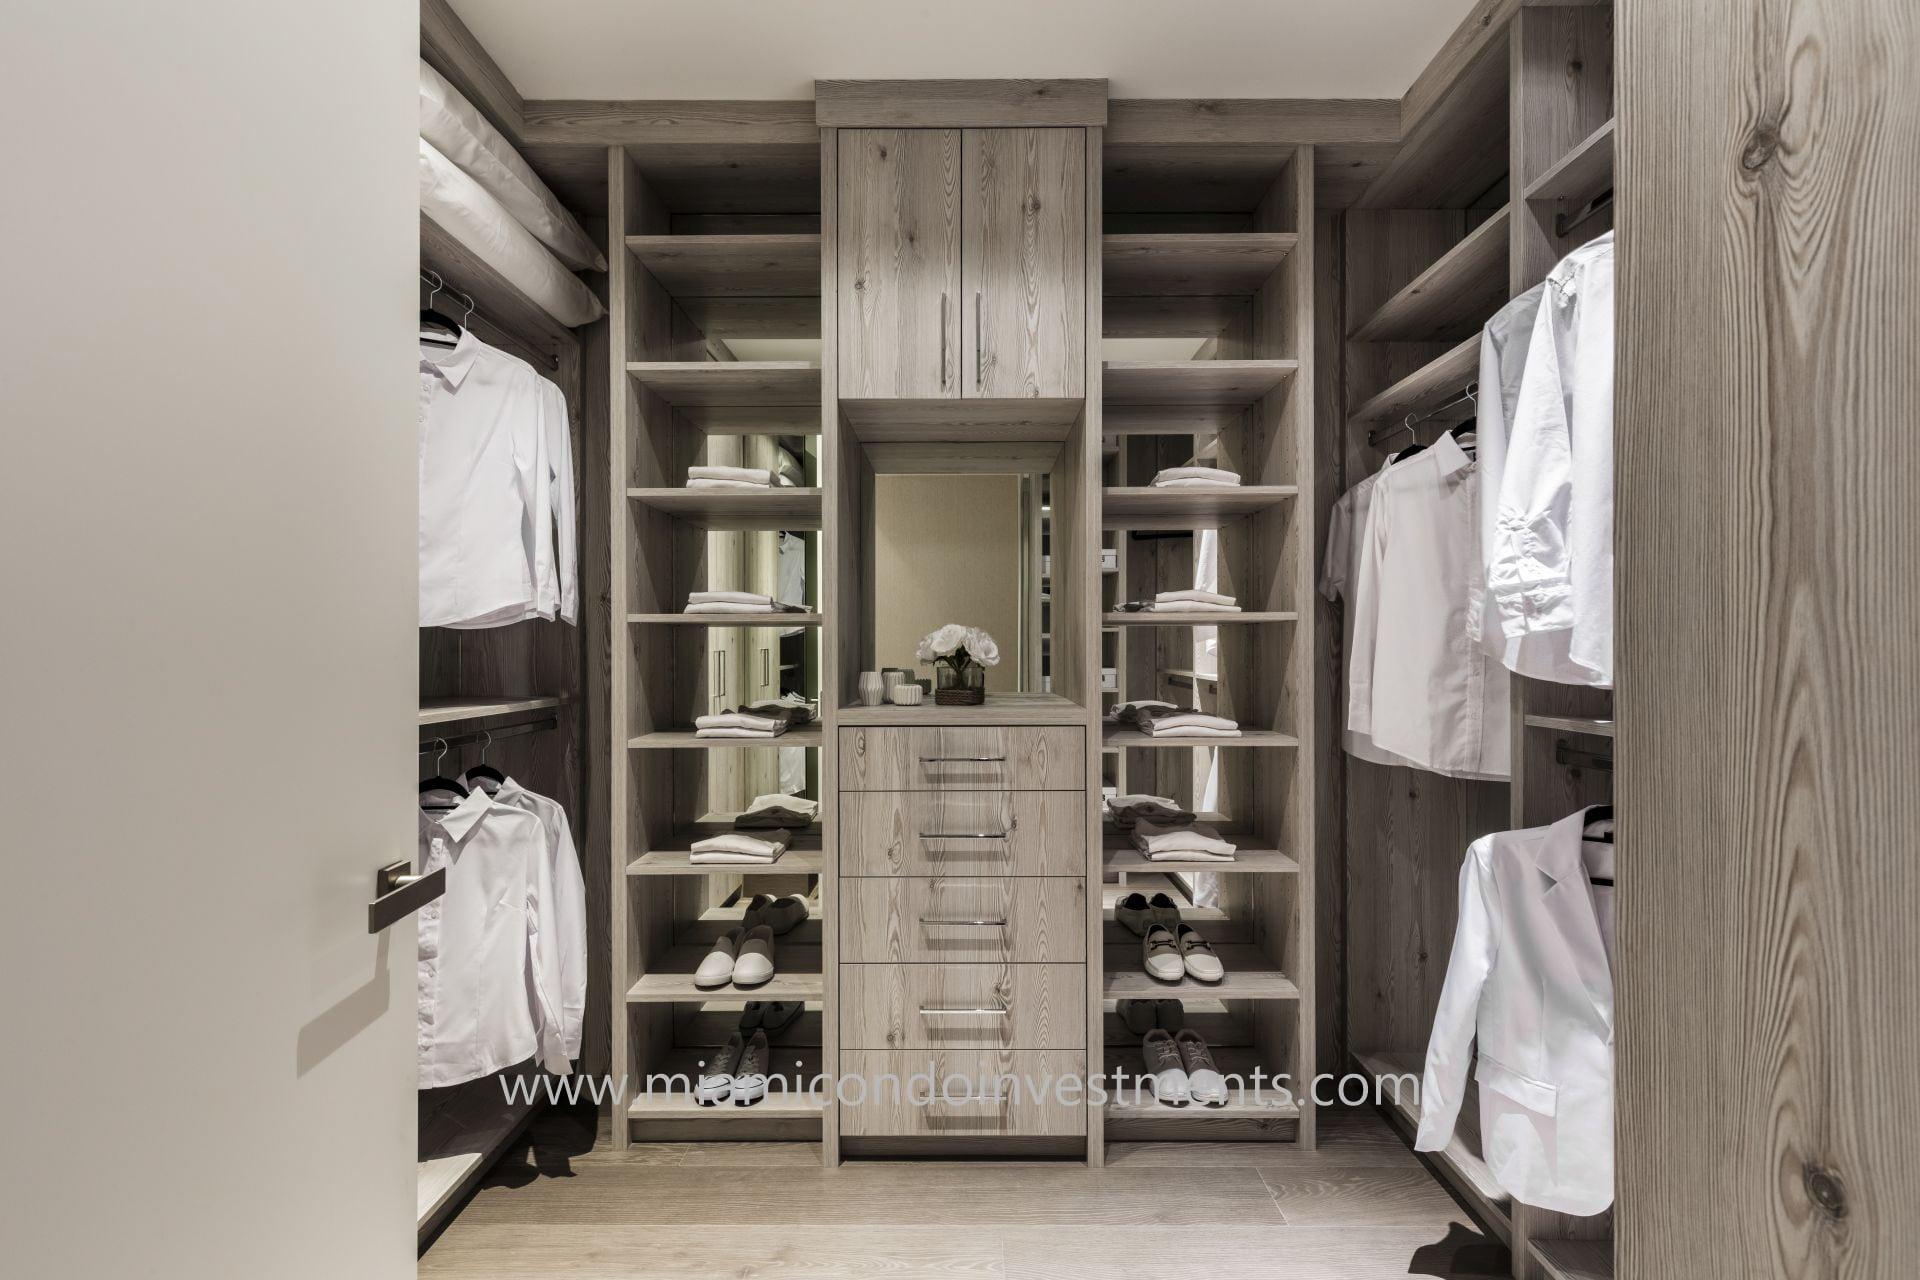 Kids walk-in closet designed by Antrobus+Ramirez